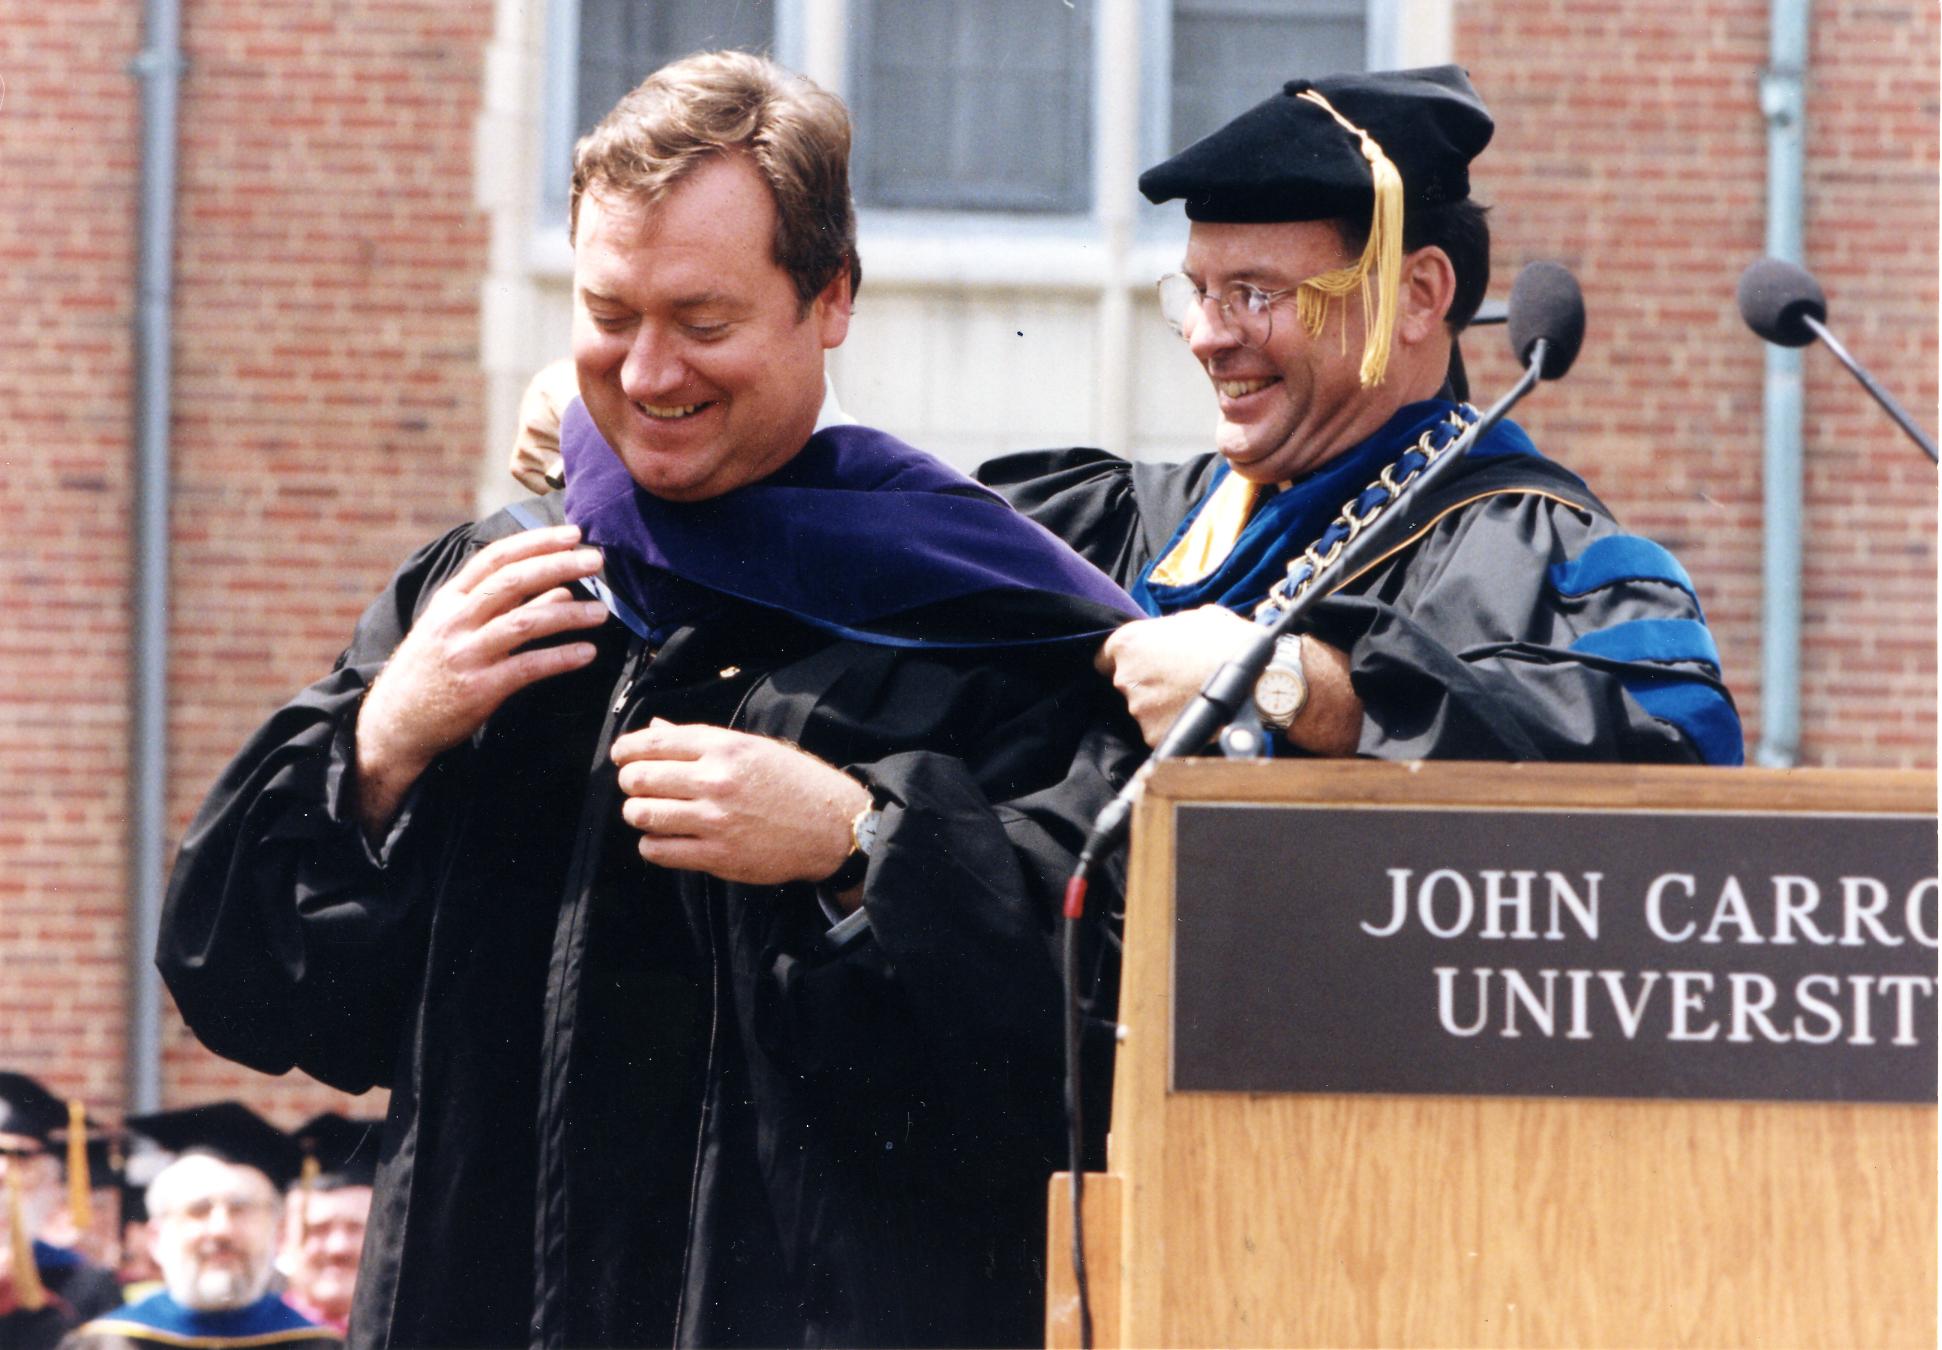 TIM RUSSERT RECEIVING AN HONORARY DEGREE FROM JOHN CARROLL UNIVERSITY IN 1997 (PHOTO BY JOHN CARROLL UNIVERSITY)